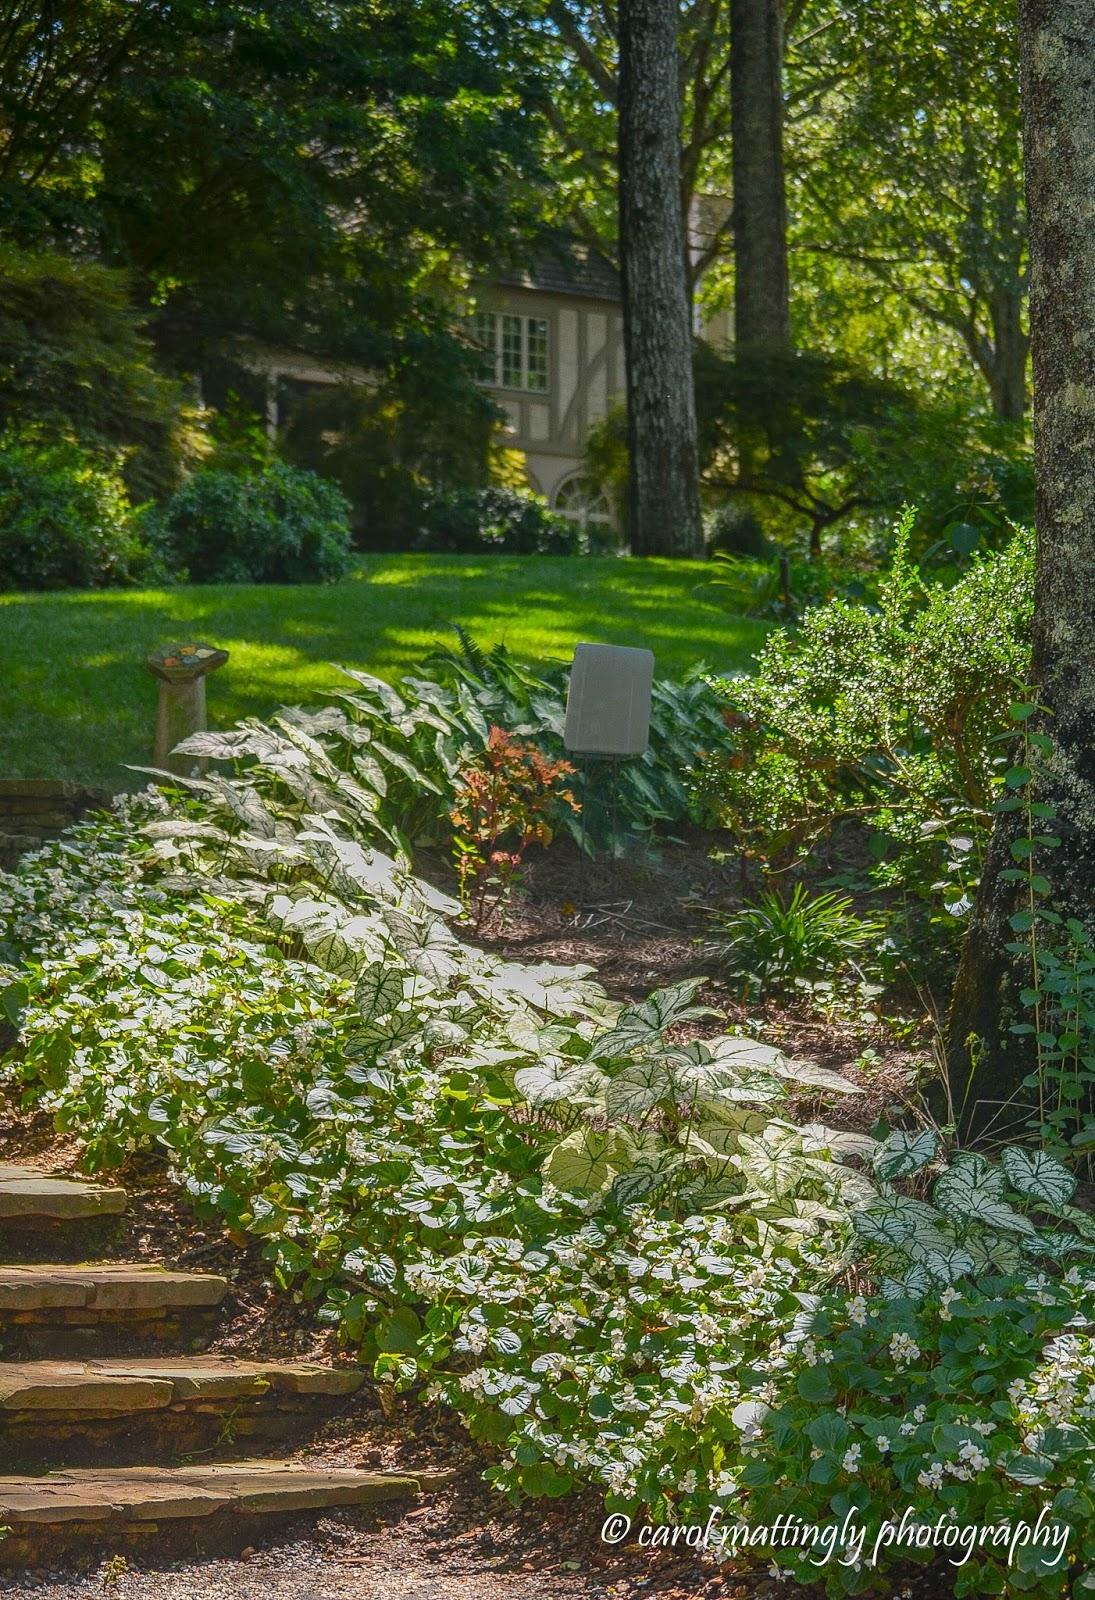 Carol Mattingly Photography: The Manor House, Gibbs Gardens